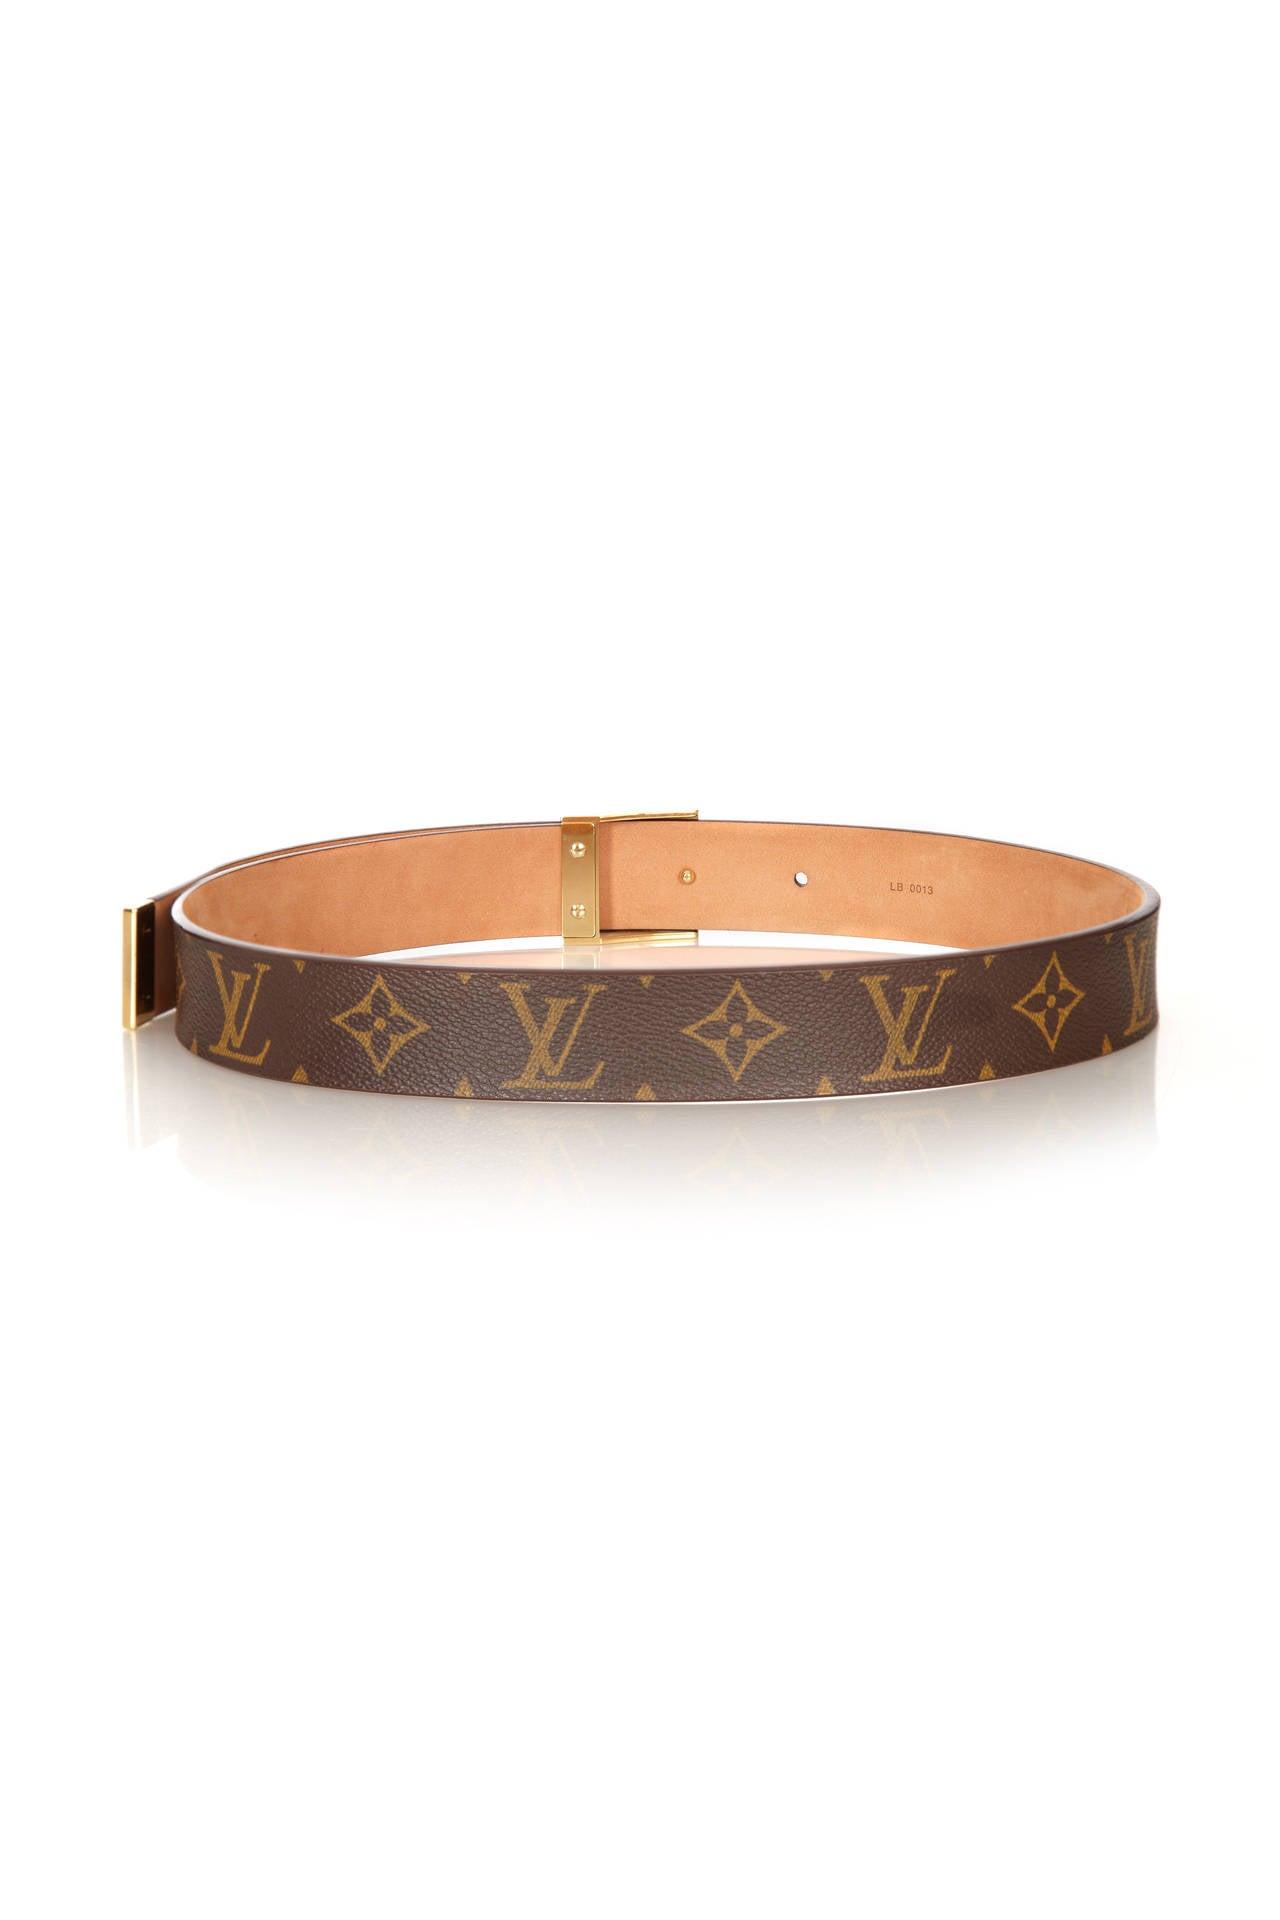 Louis Vuitton Monogram Belt 2